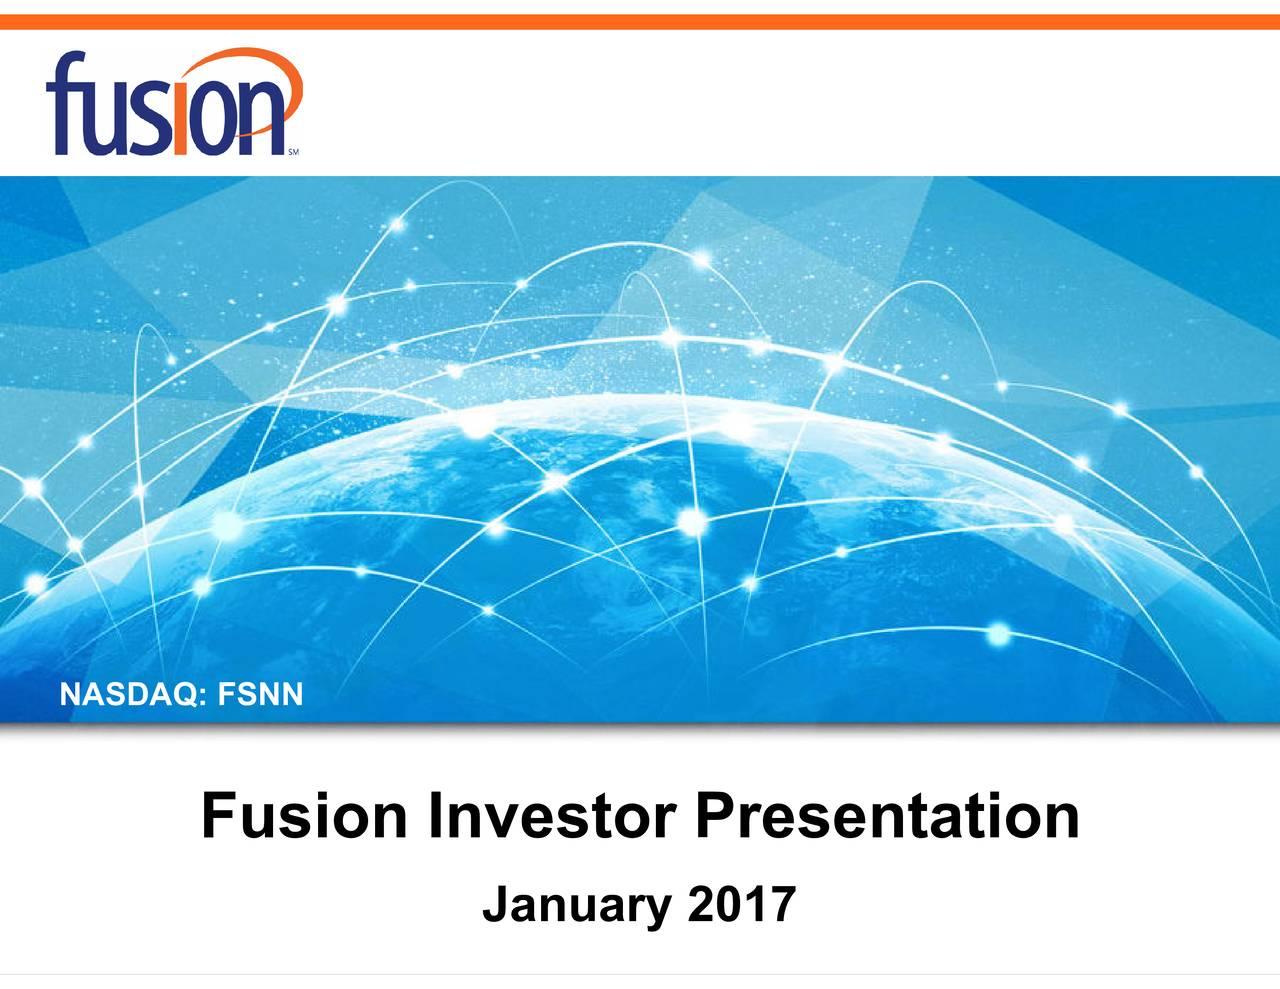 Fusion Investor Presentation NASDAQ: FSNN